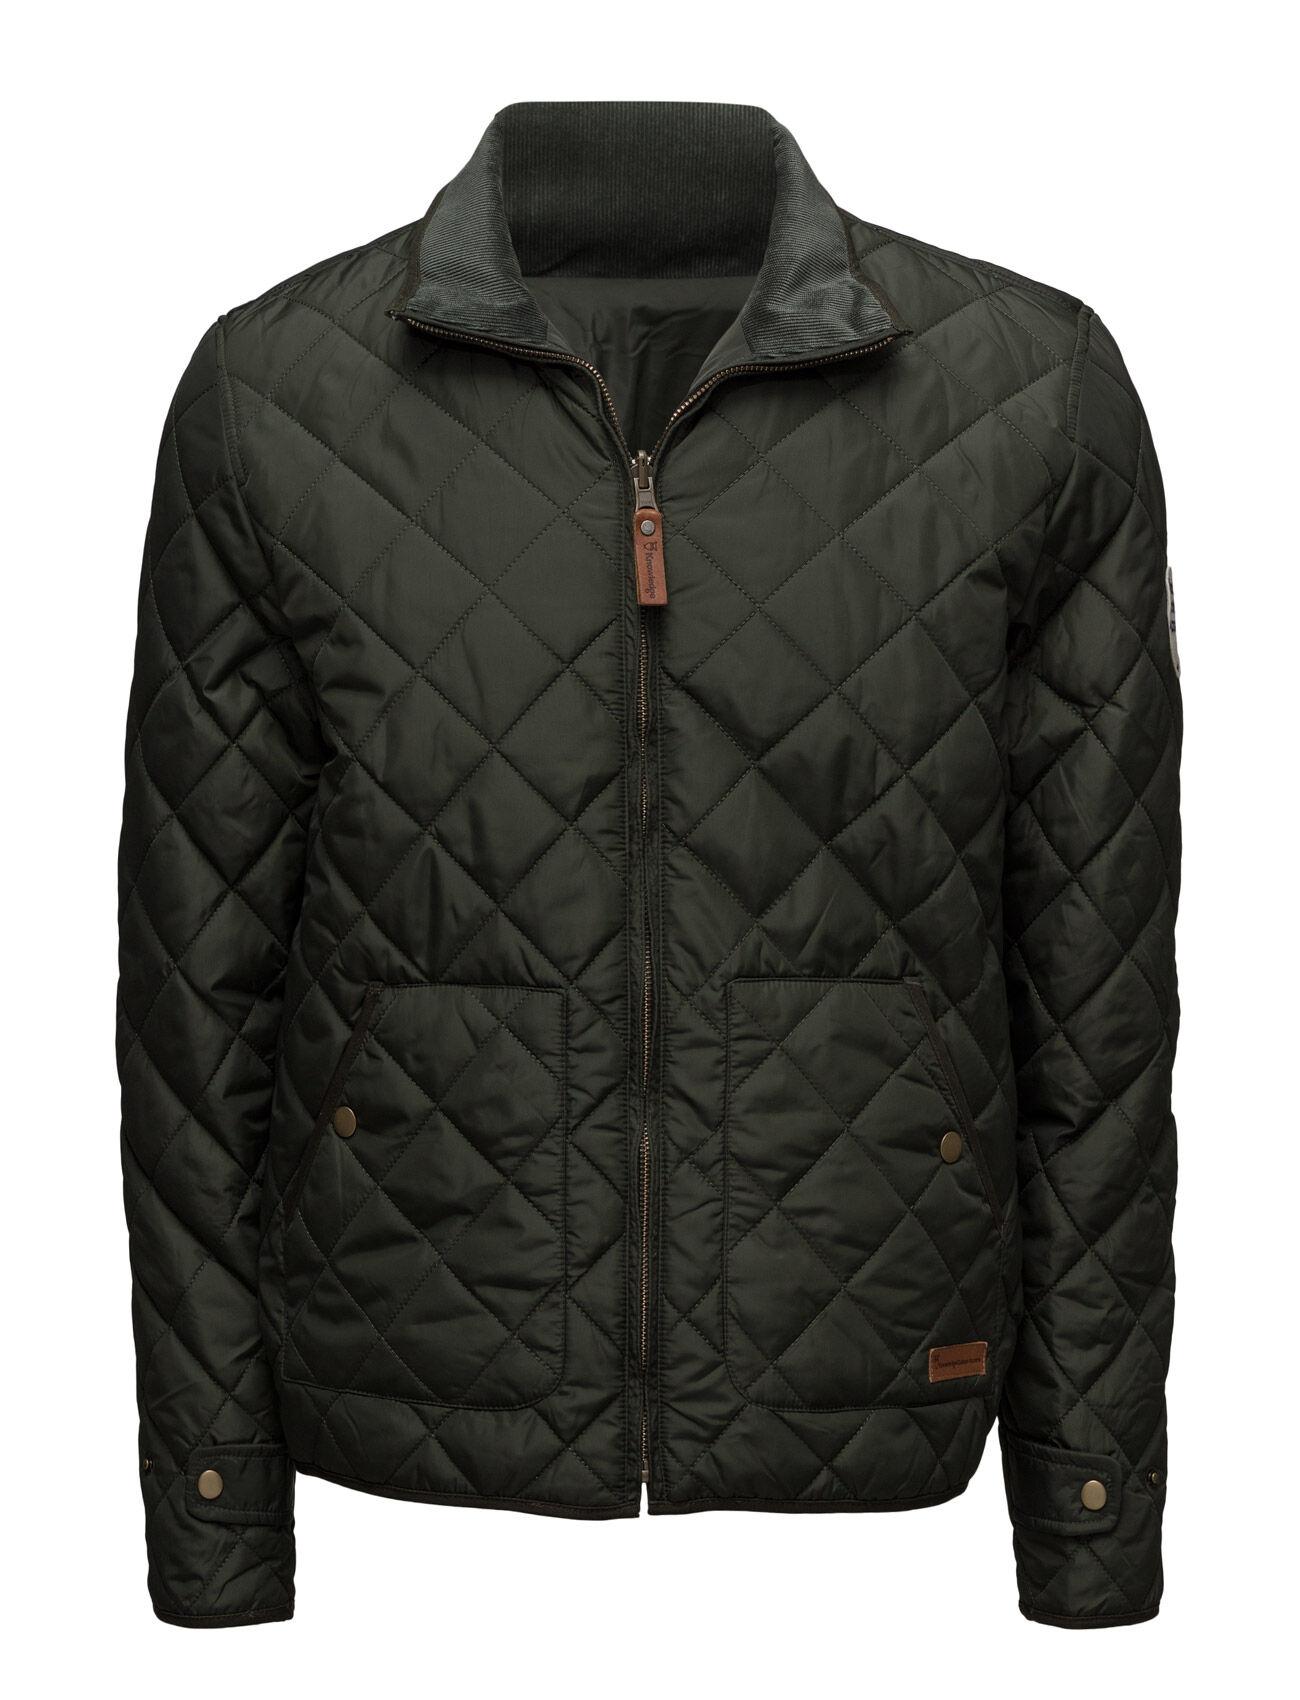 Knowledge Cotton Apparel Pet Light Jacket Reversible - Grs/V